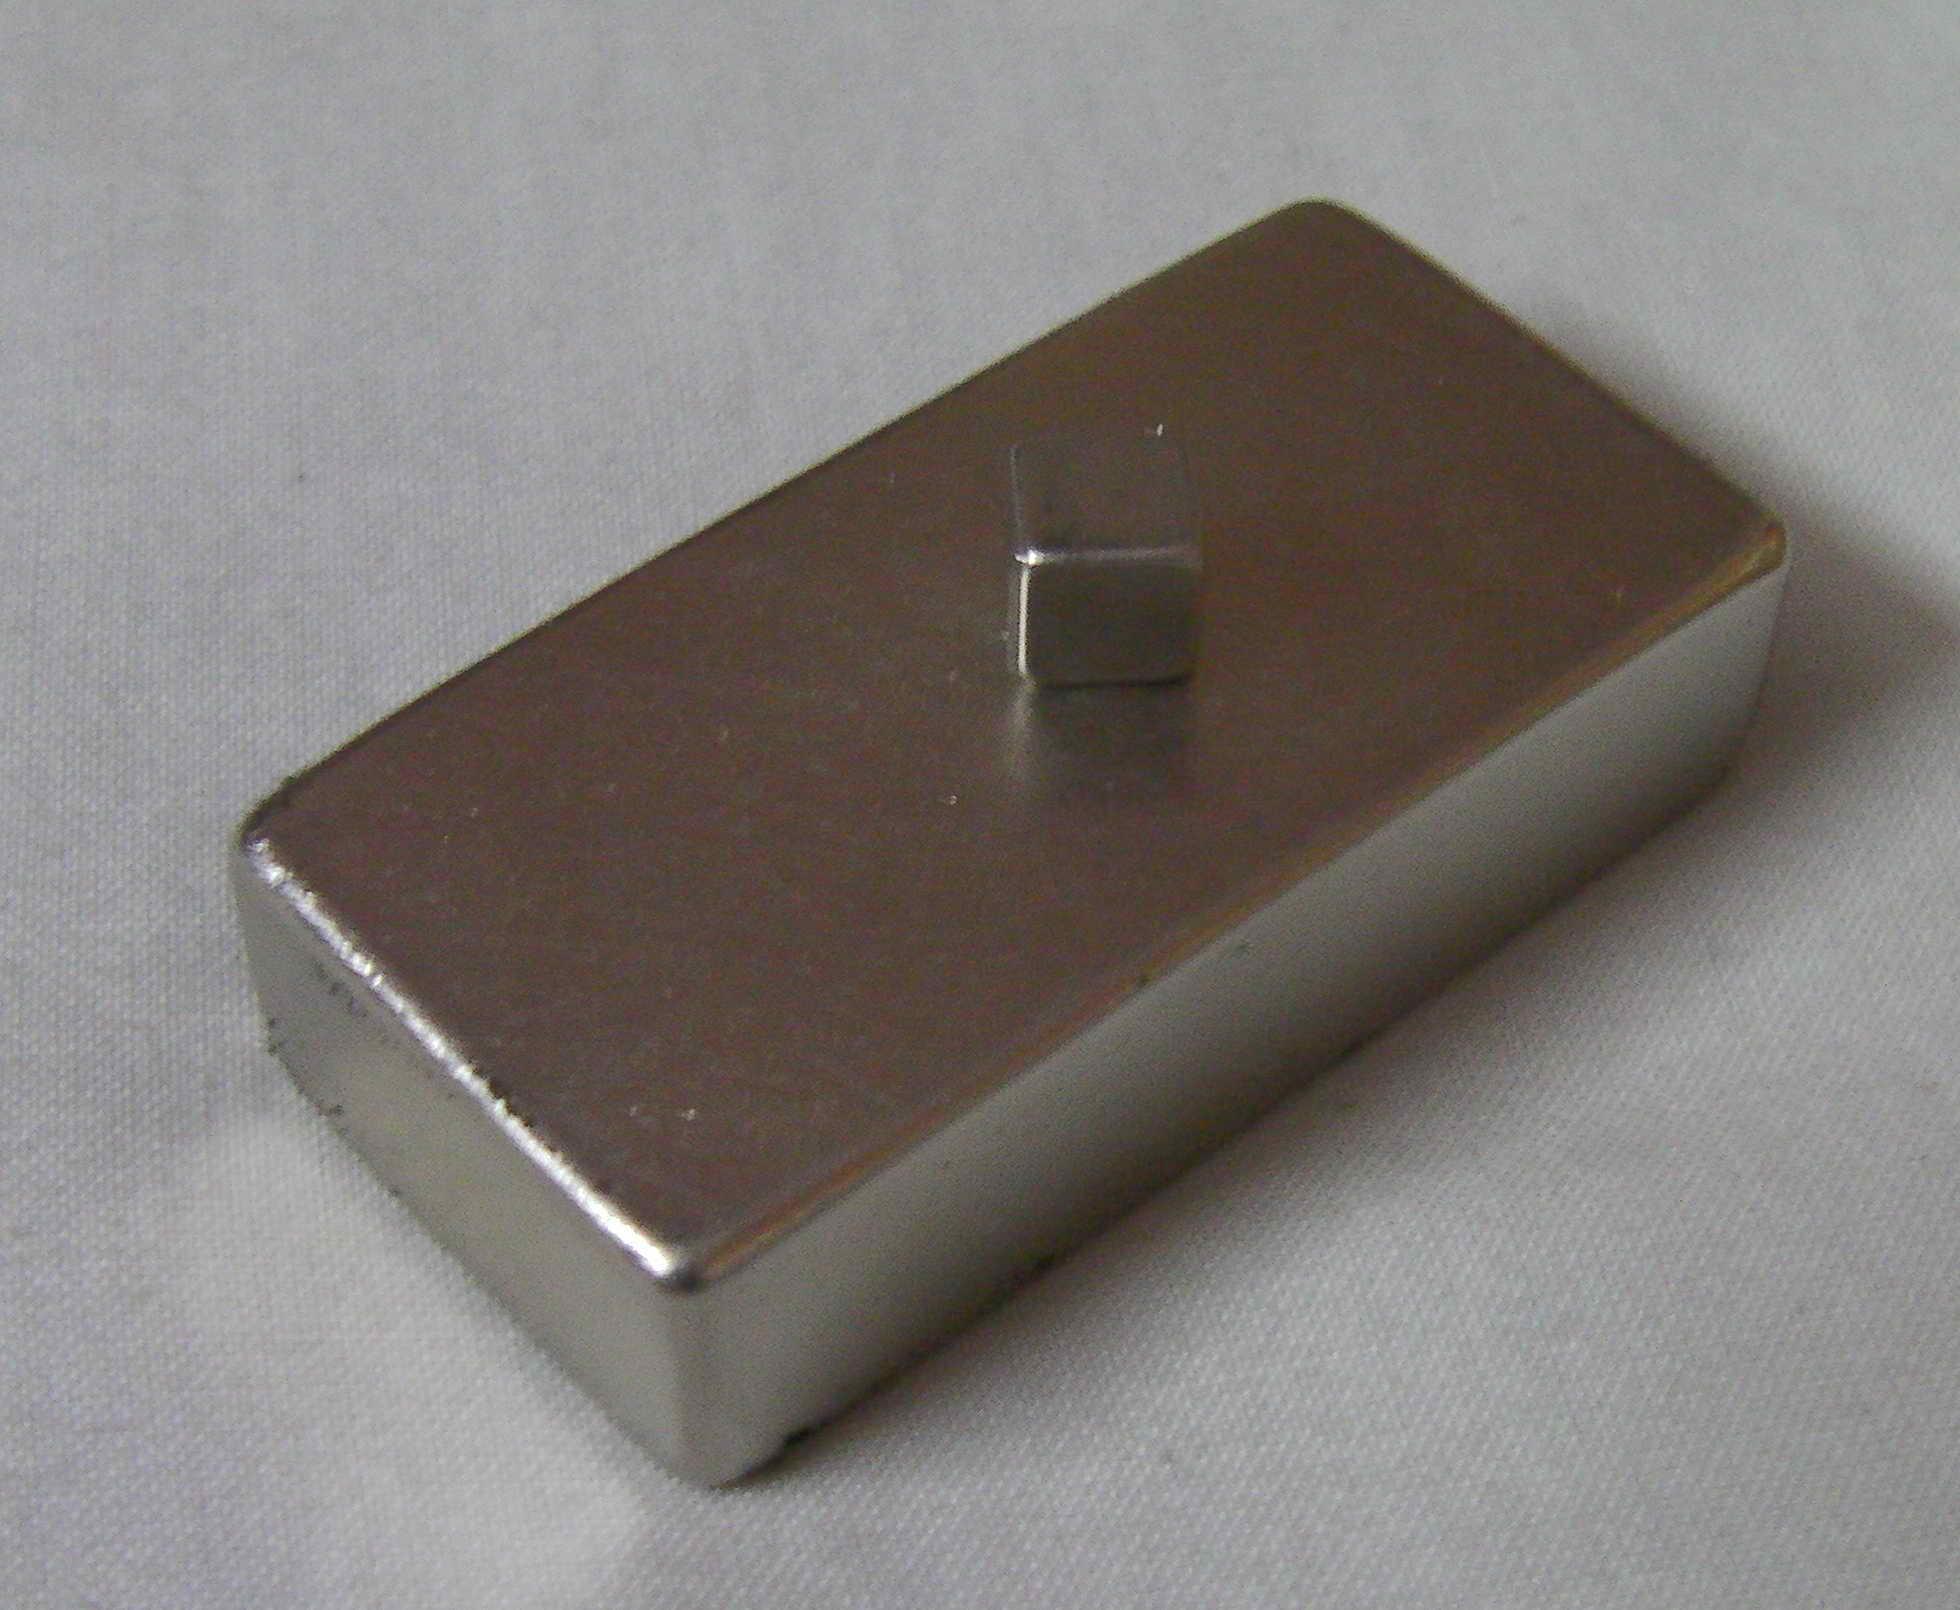 Rare Earth Magnetics